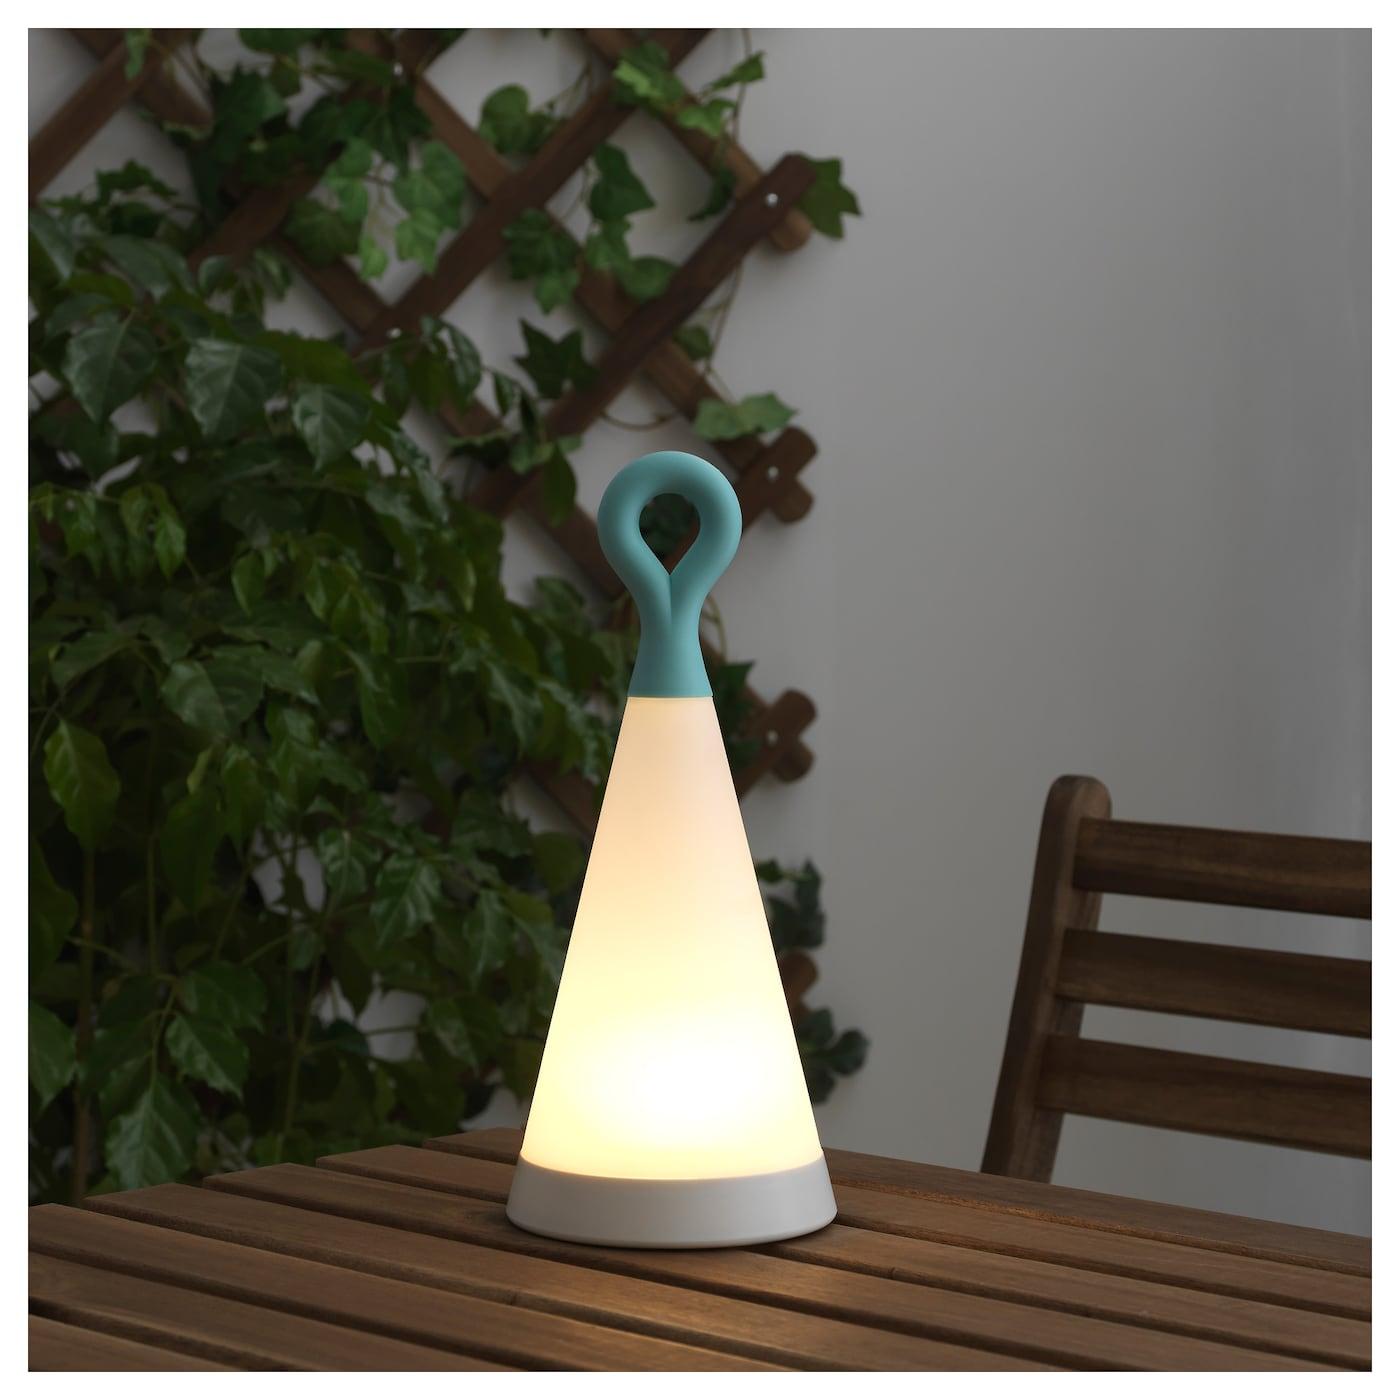 solvinden led solar powered table lamp triangle blue white. Black Bedroom Furniture Sets. Home Design Ideas